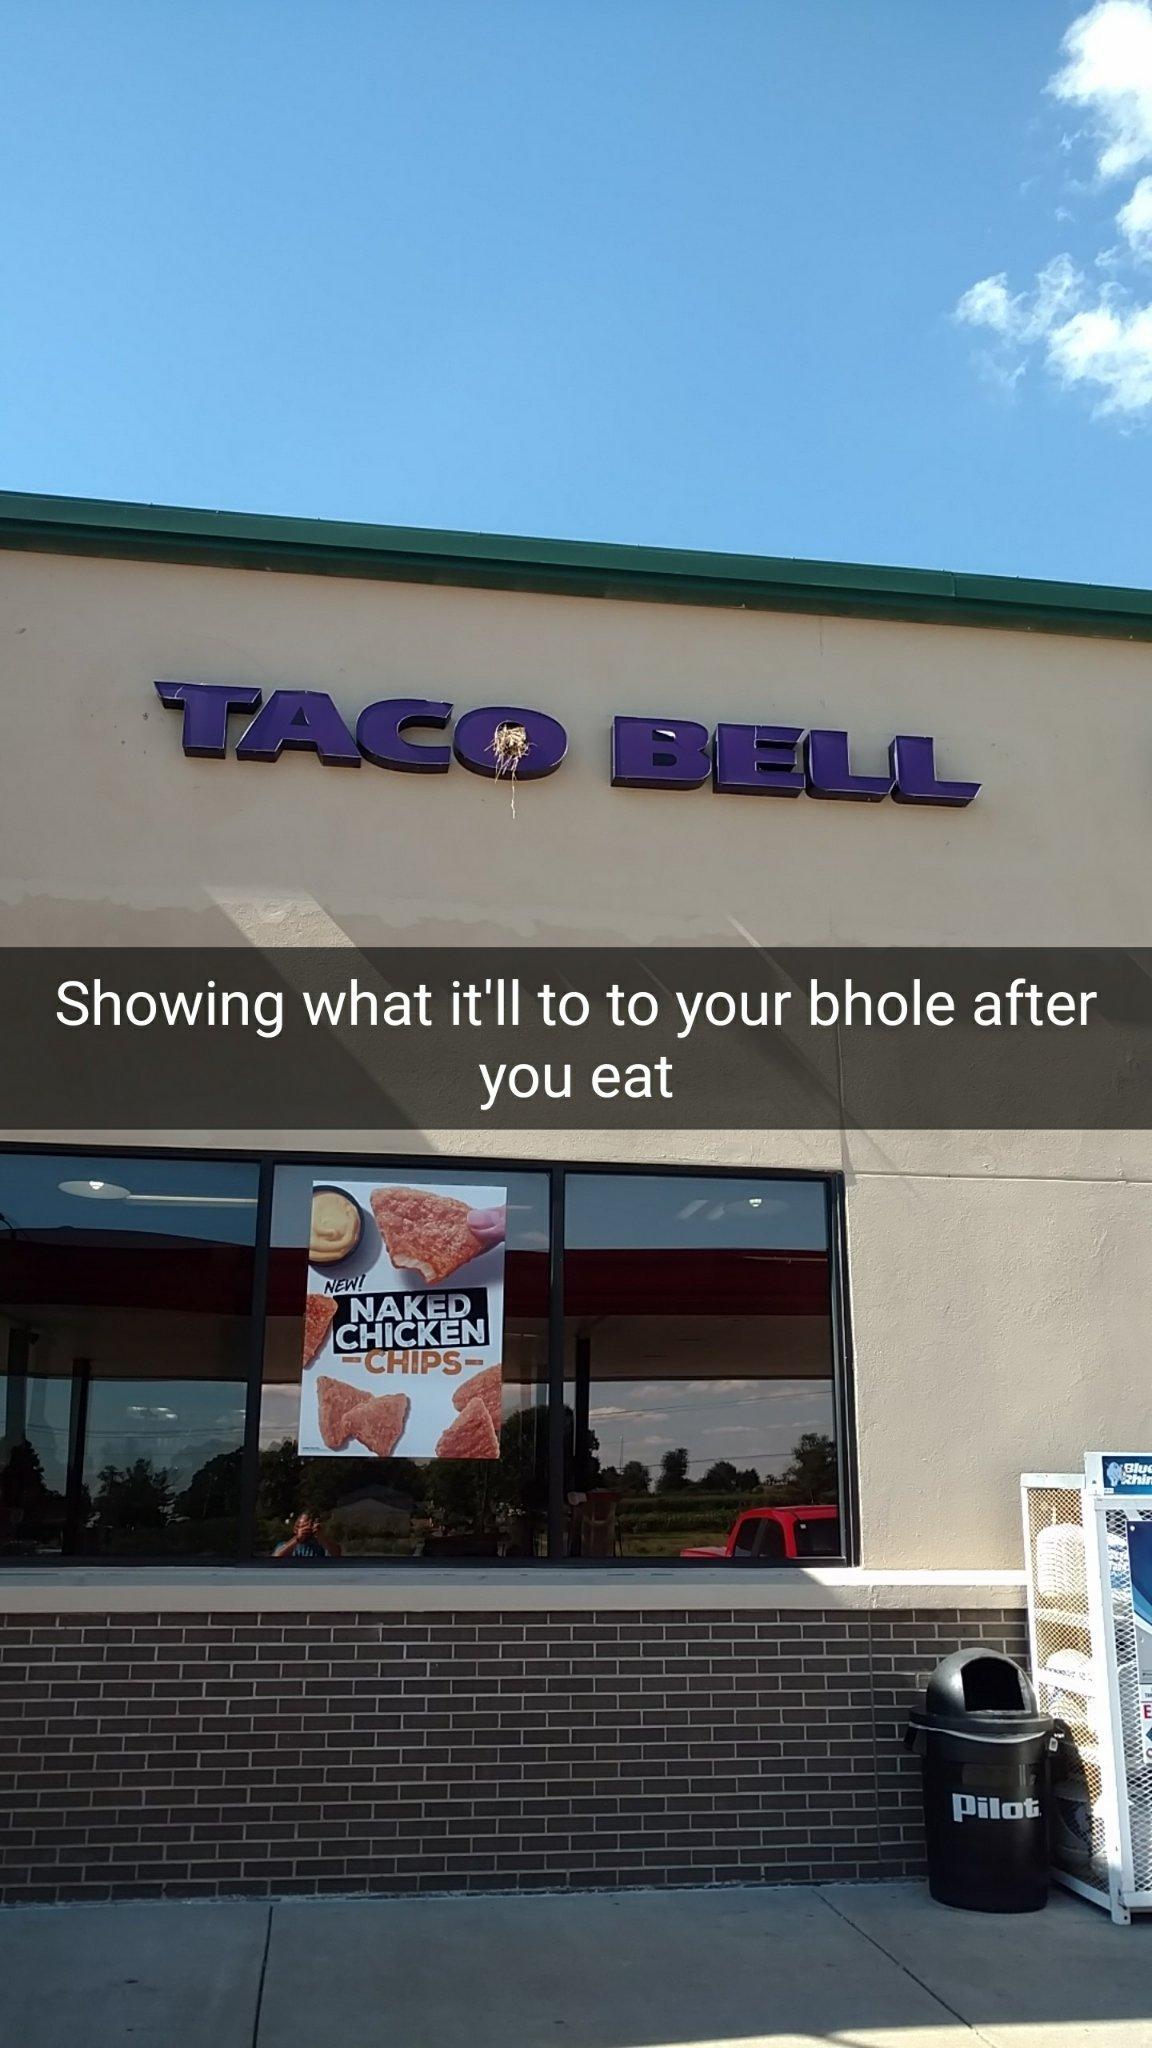 #7, soft taco with a baja blast please